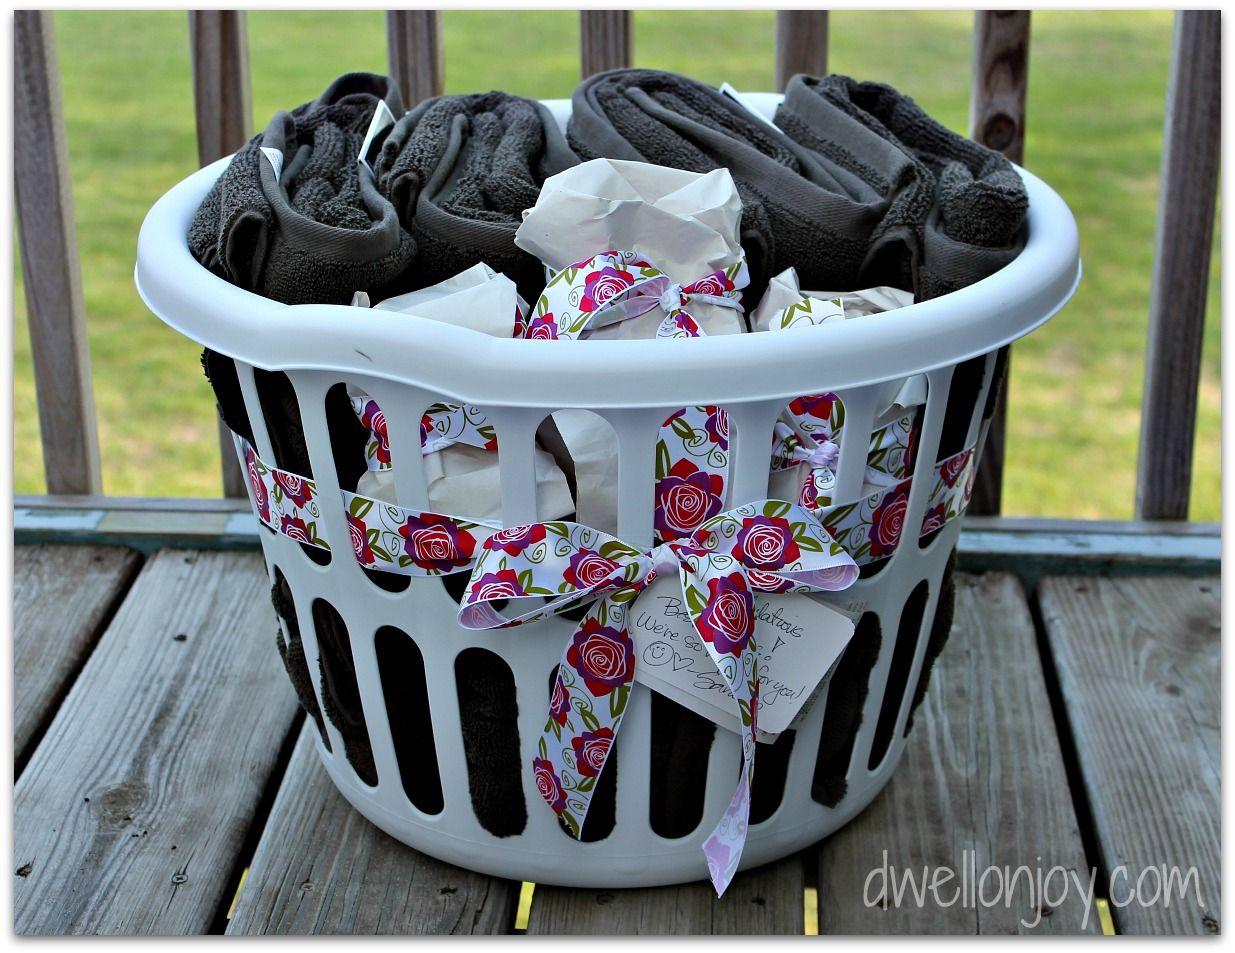 Unique bridal shower gift basket ideas free image